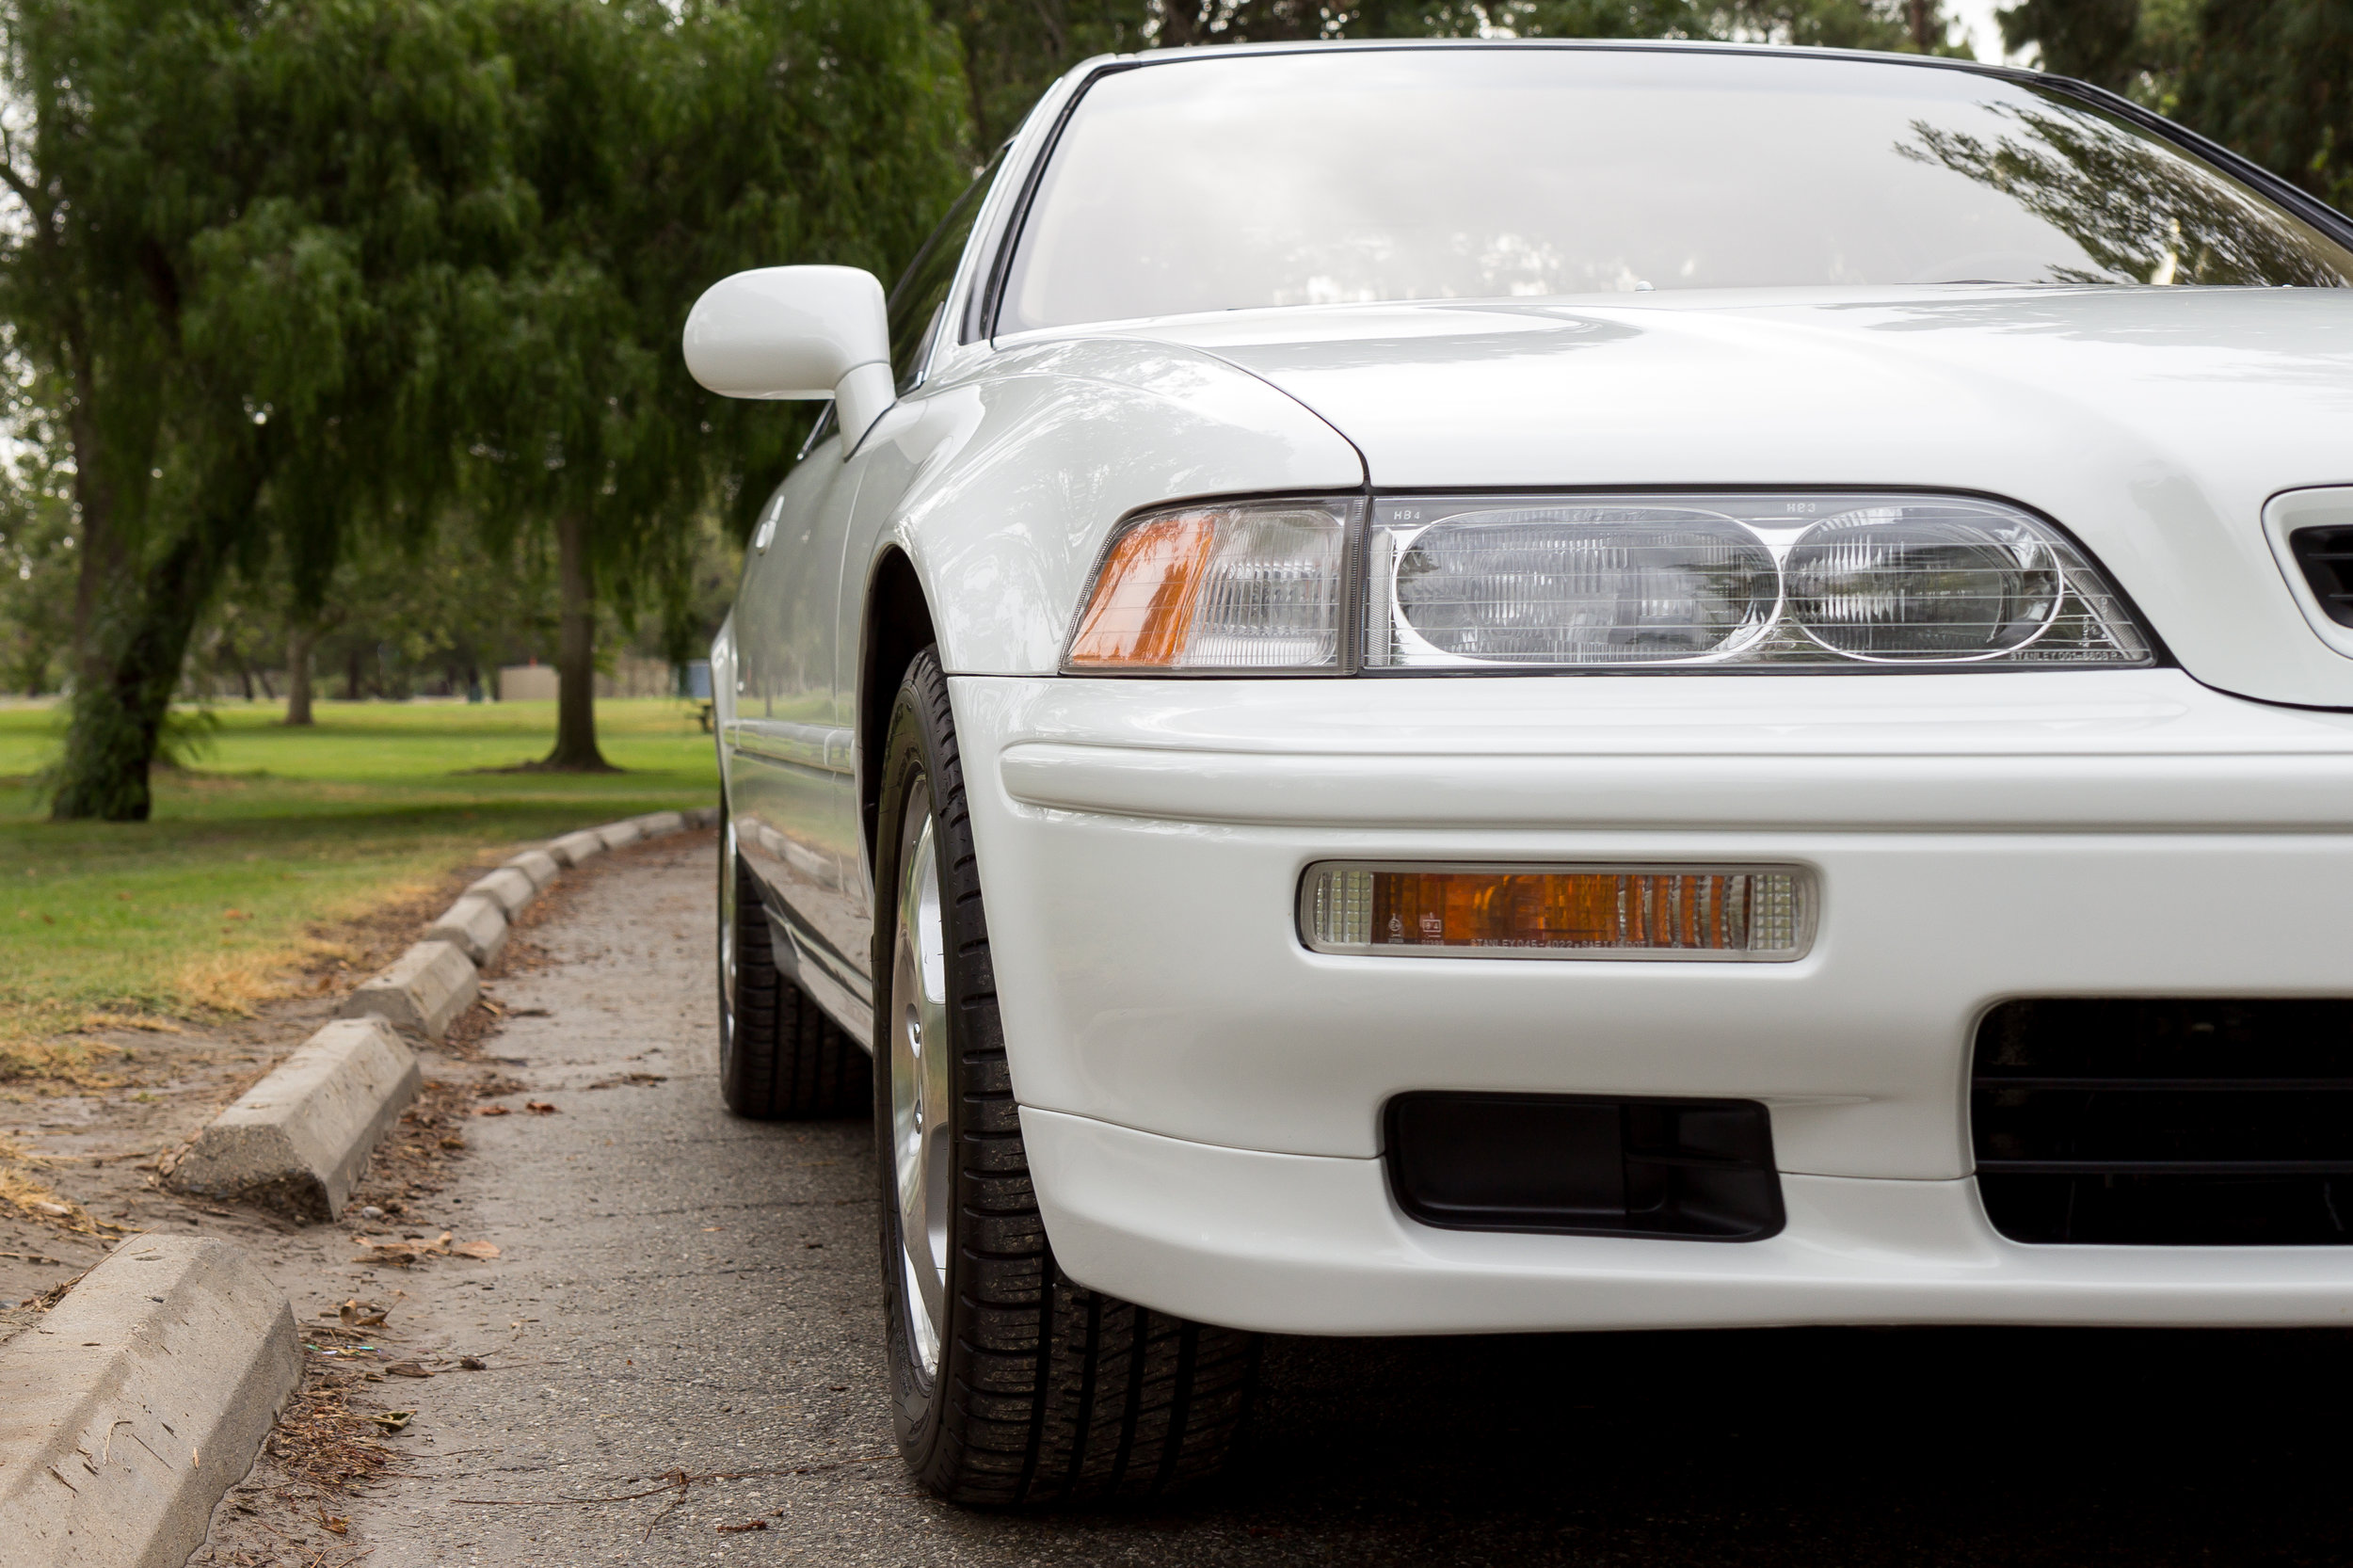 1994 Acura Legend Coupe-42.JPG